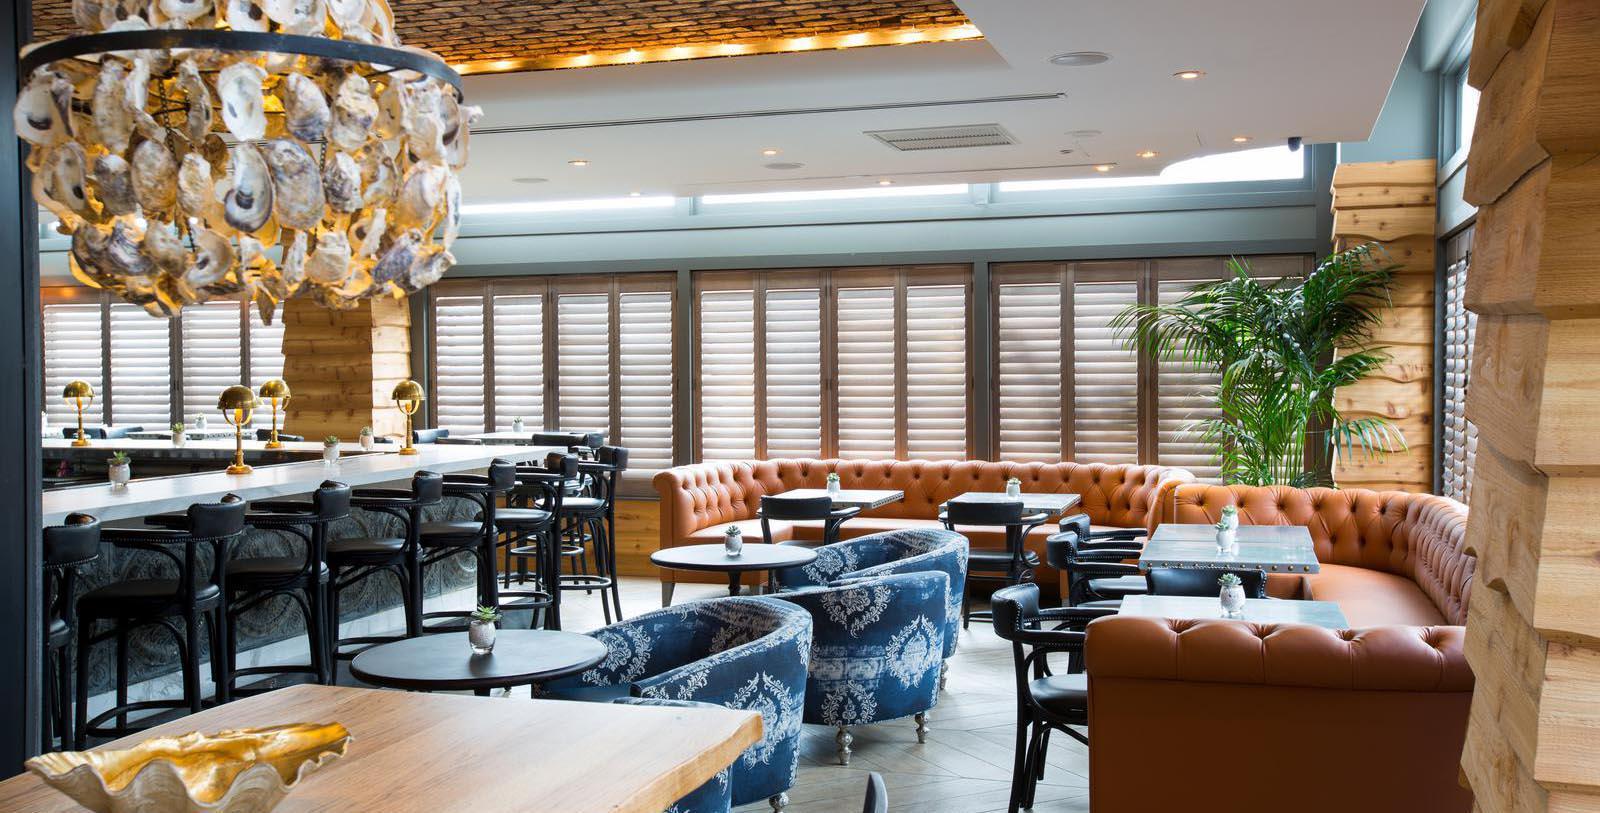 Image of The Pearl Restaurant & Bar at The Sam Houston Hotel, 1924, Member of Historic Hotels of America, in Houston, Texas, Taste